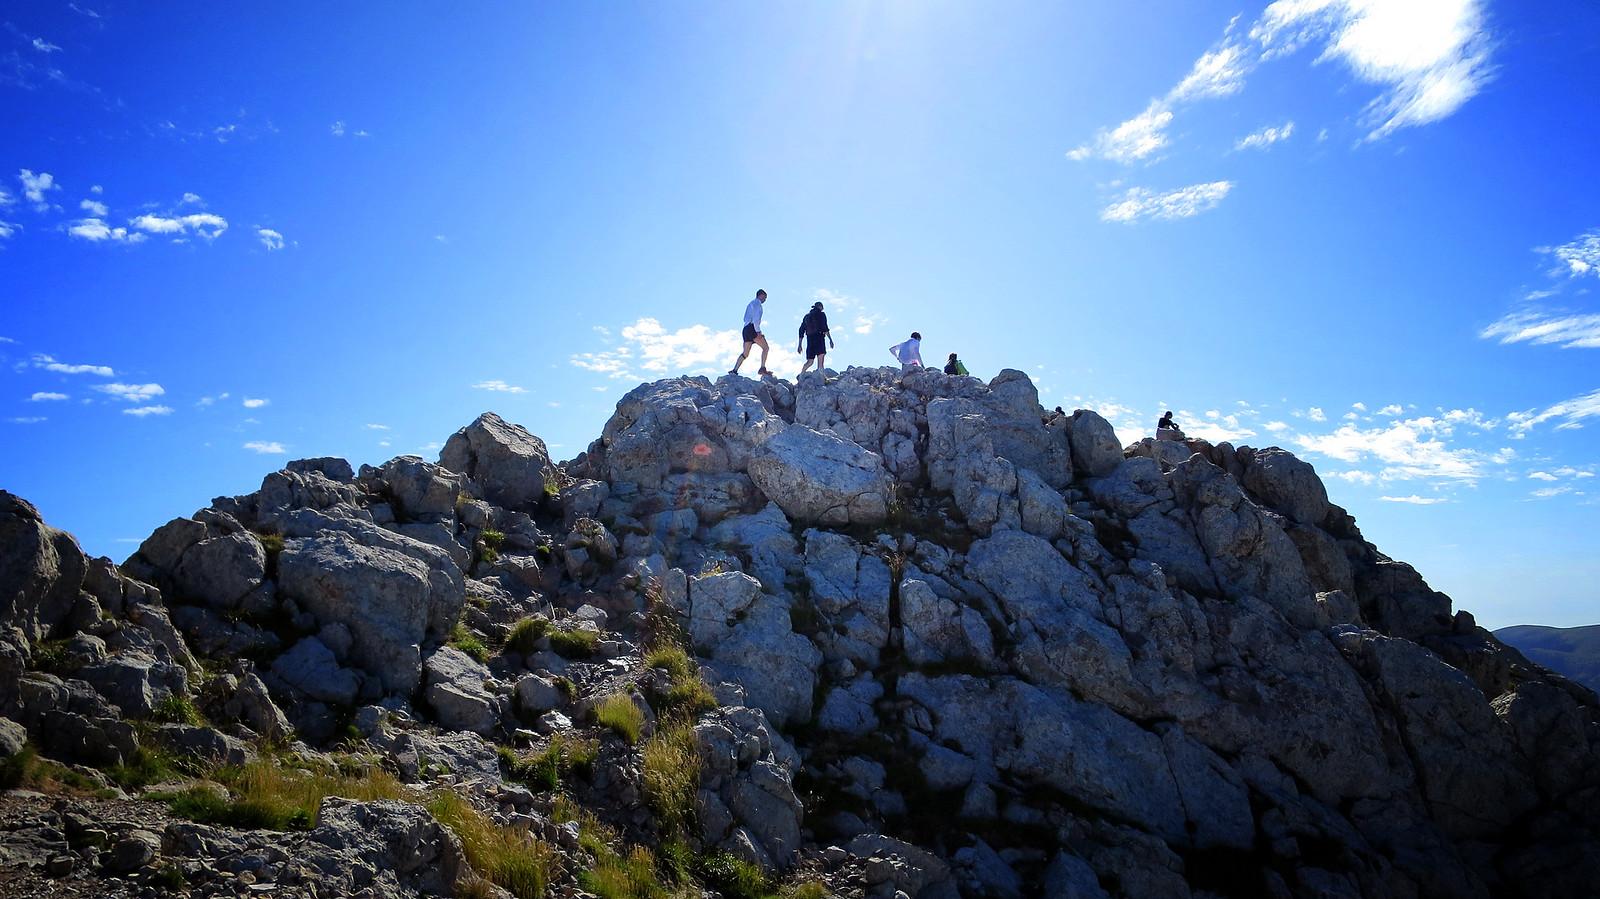 Pedraforca: Mirador Gresolet - Collada del Verdet - Pedraforca - Tartera de Saldes